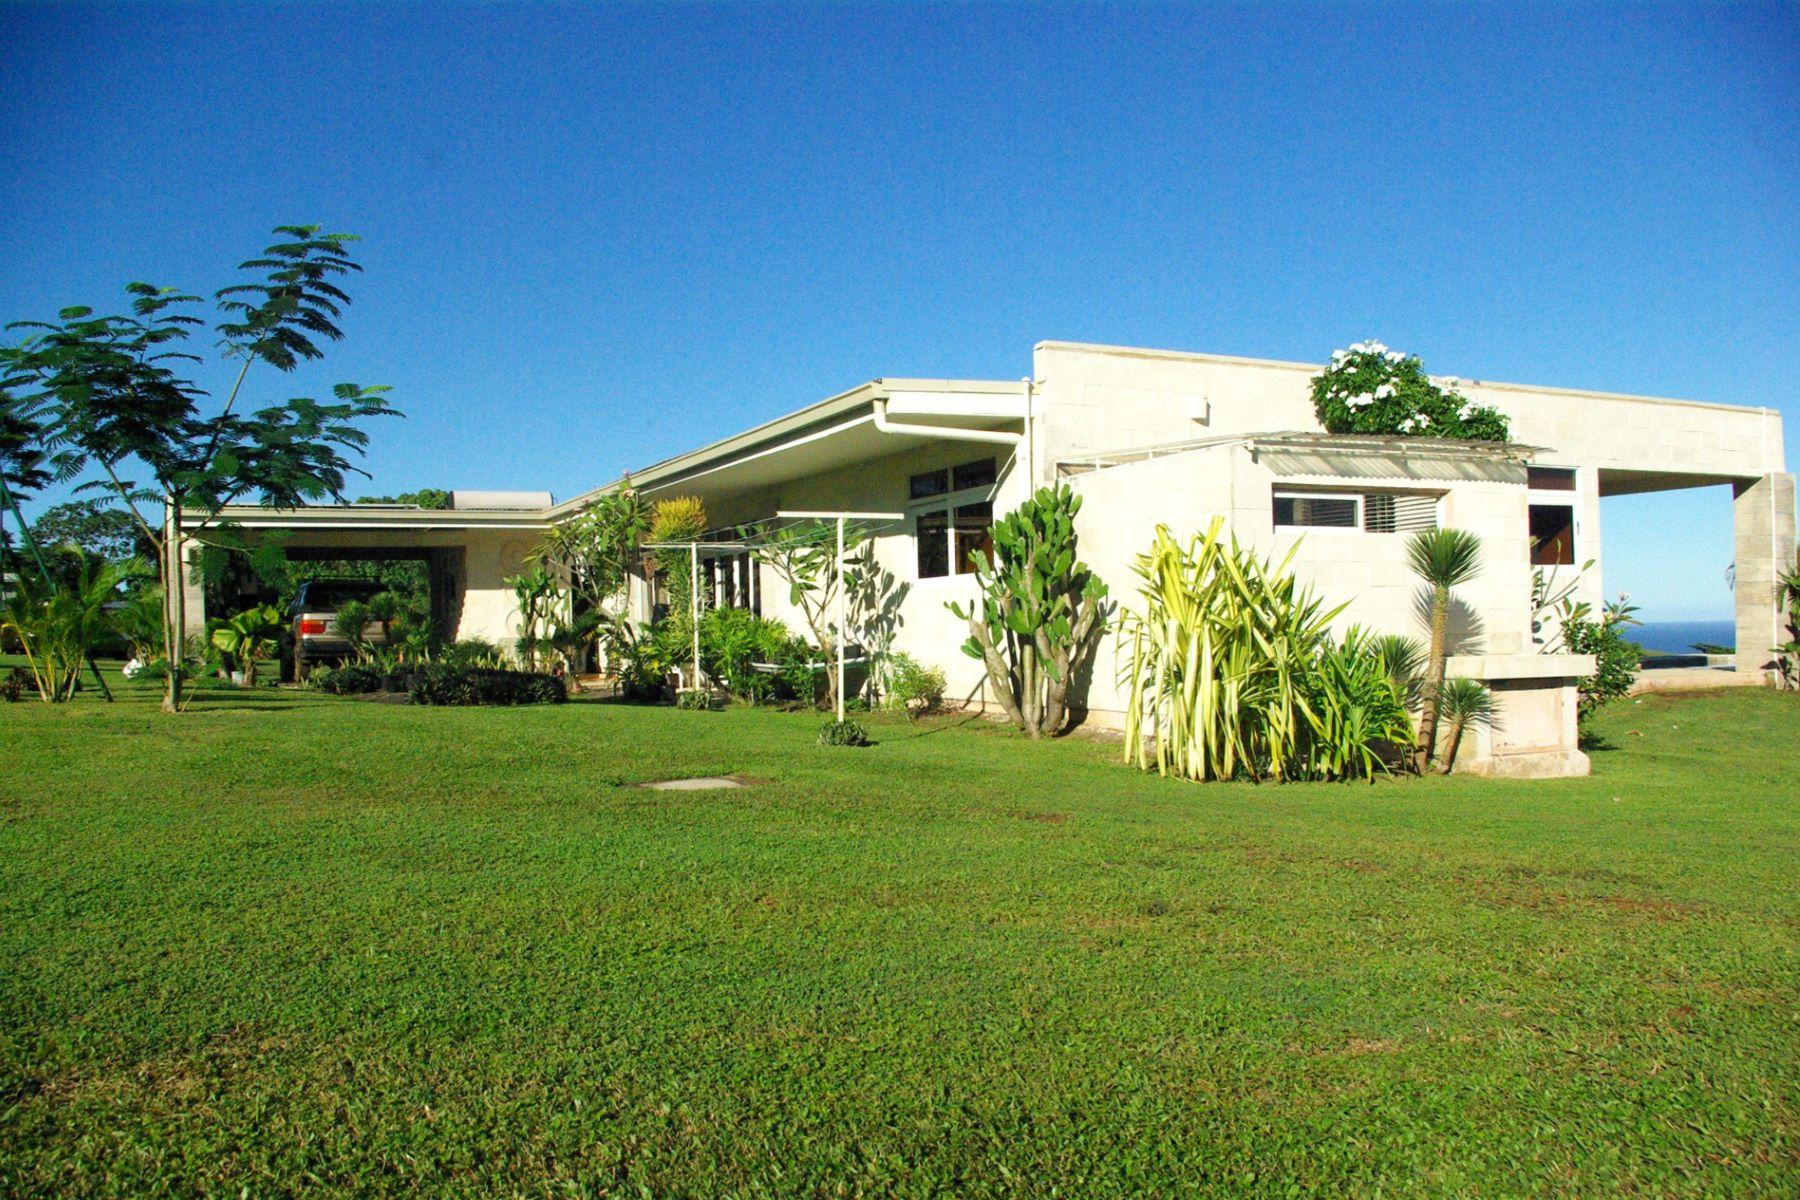 Casa Unifamiliar por un Venta en Timeless property in Tahiti Vairao Tahiti, French Polynesia